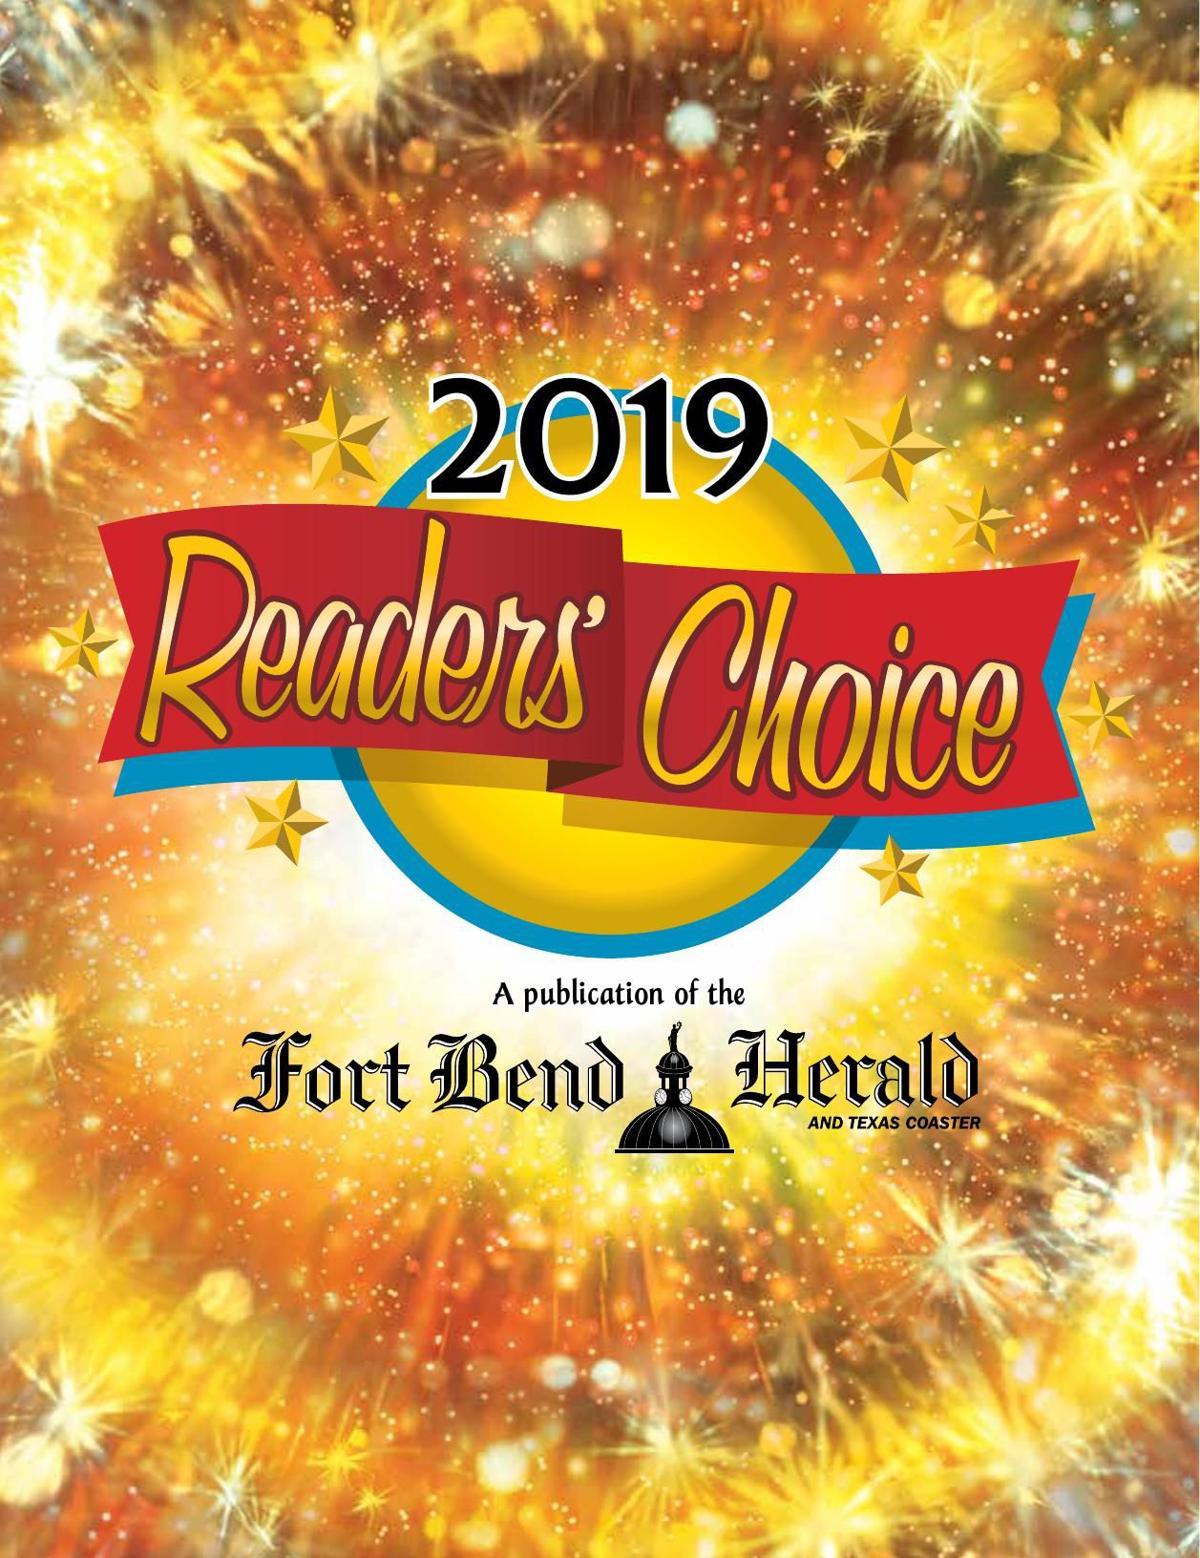 2019 Reader's Choice